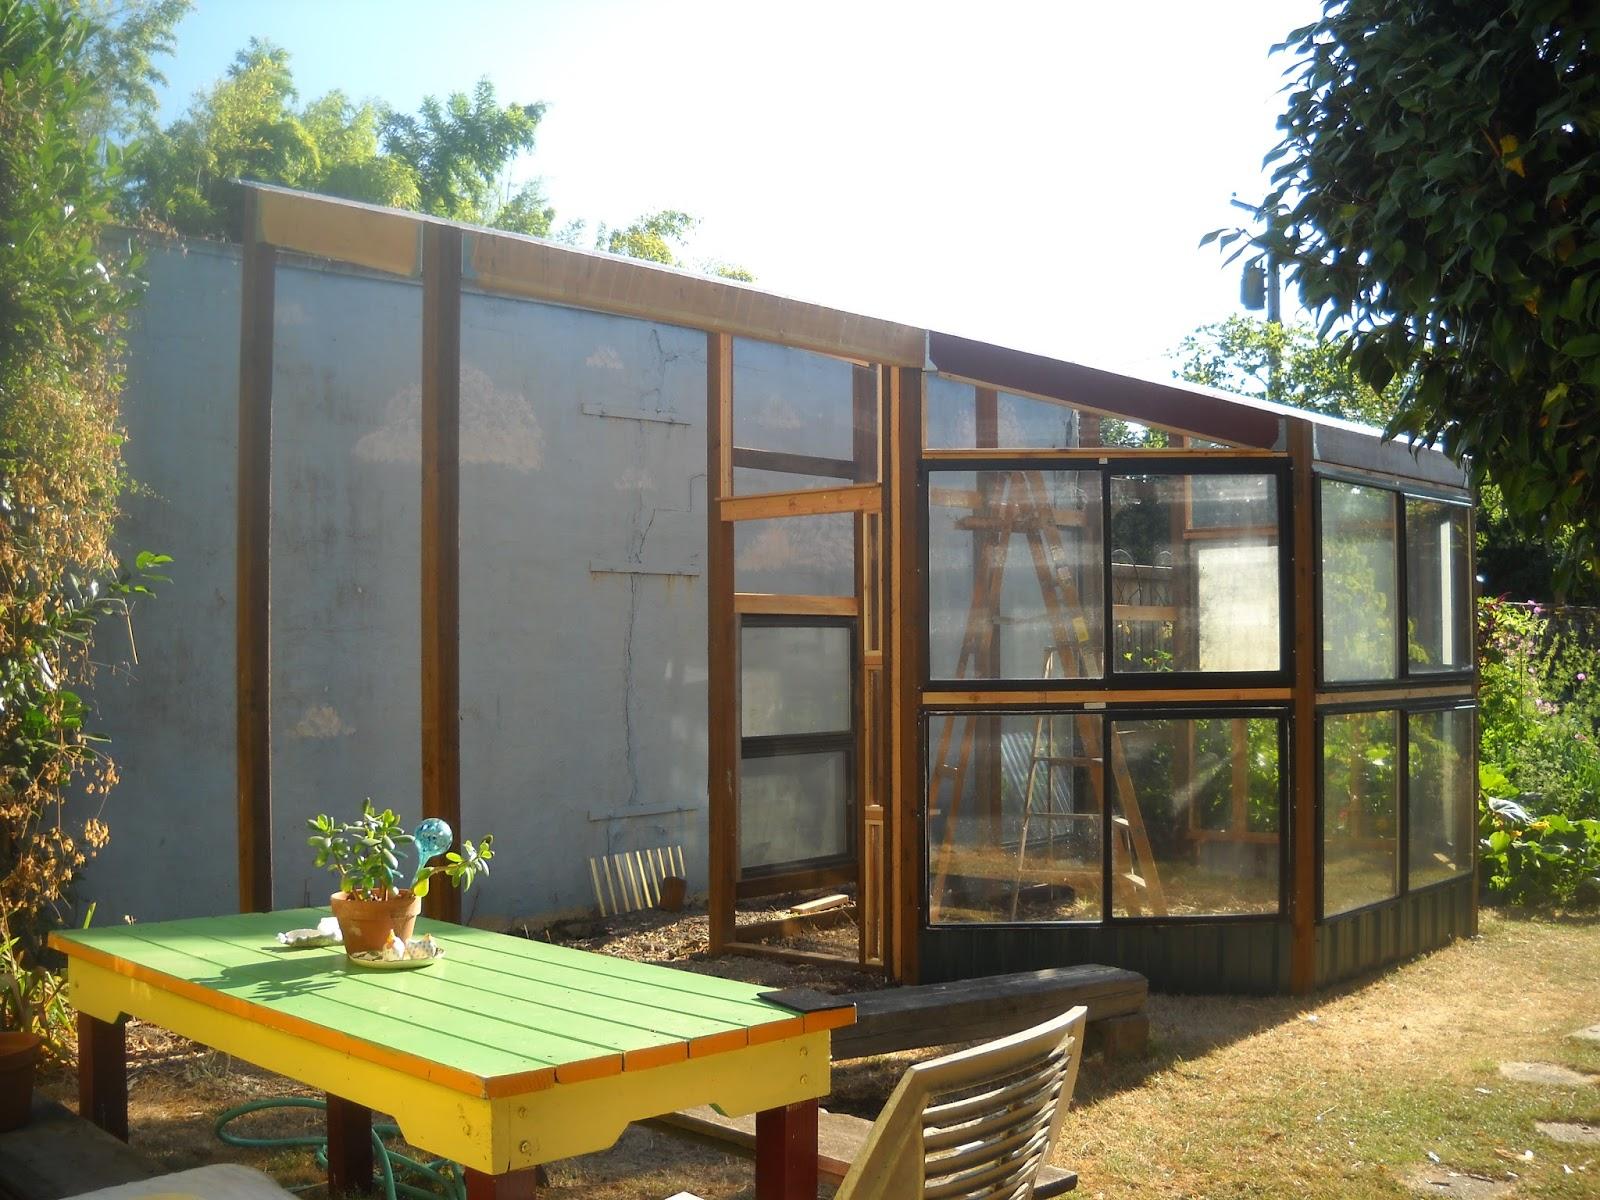 21st street urban homestead planning for solar panels part three